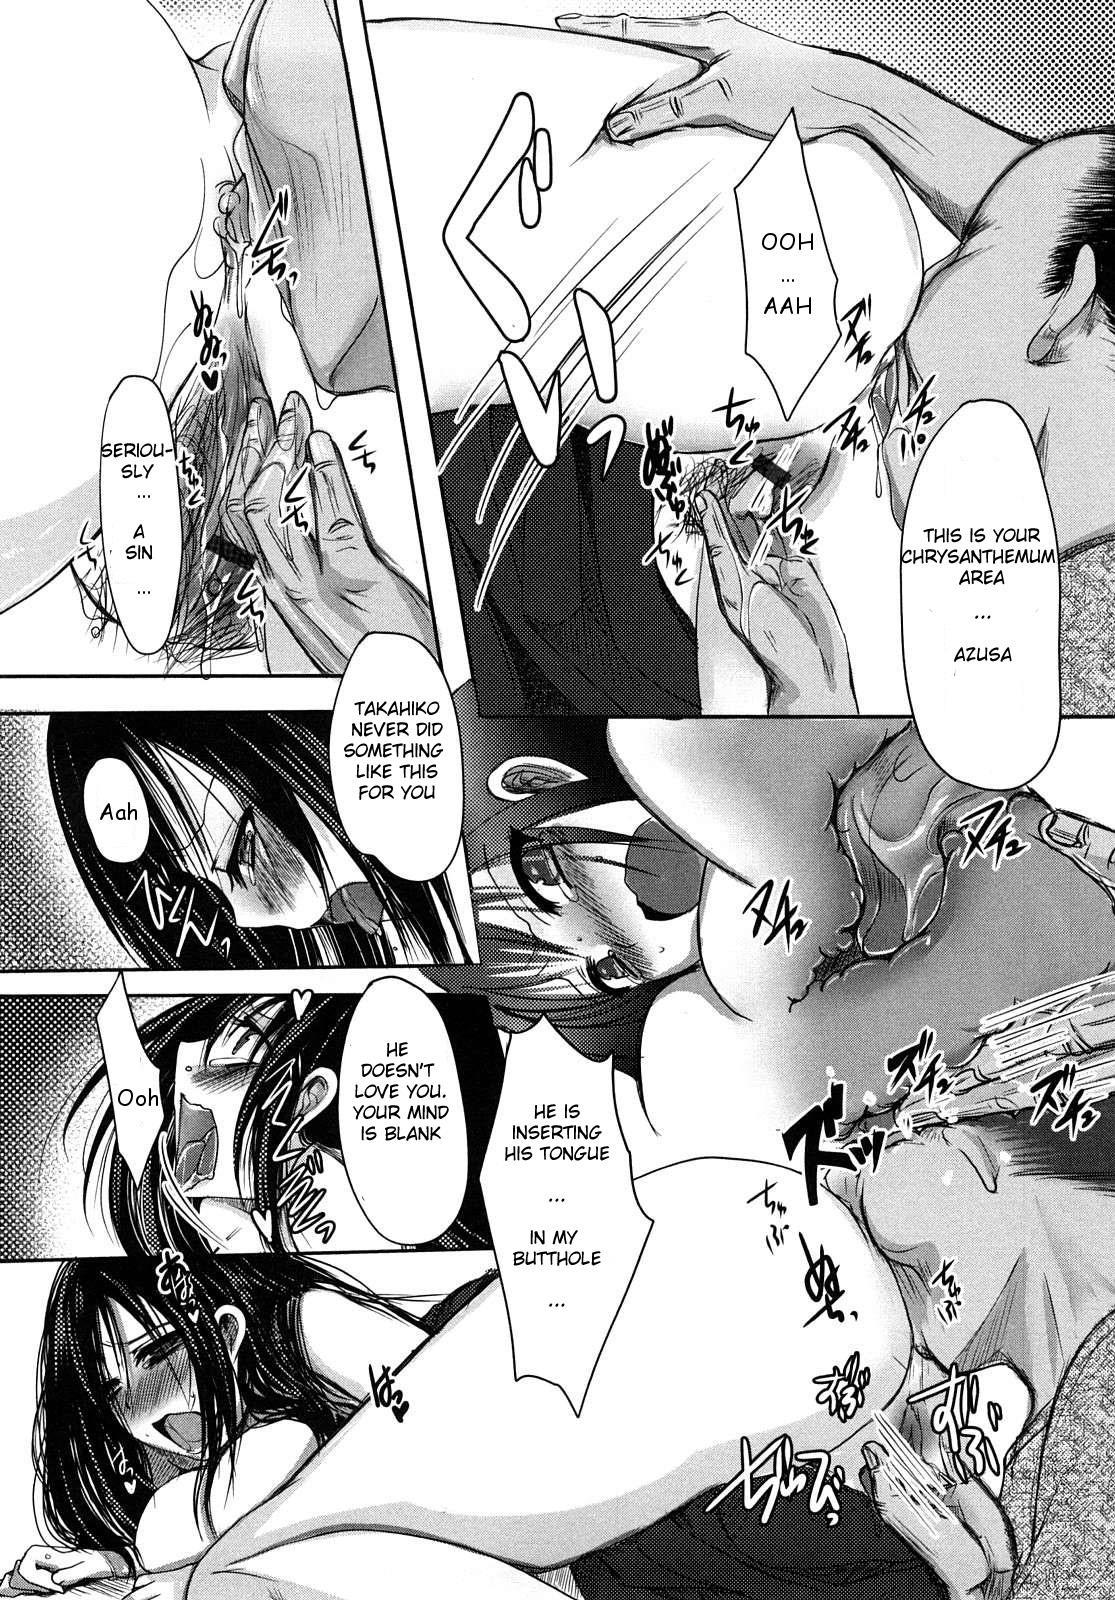 Otou-sama no Mesu   The Bitch of My Father in Law 9